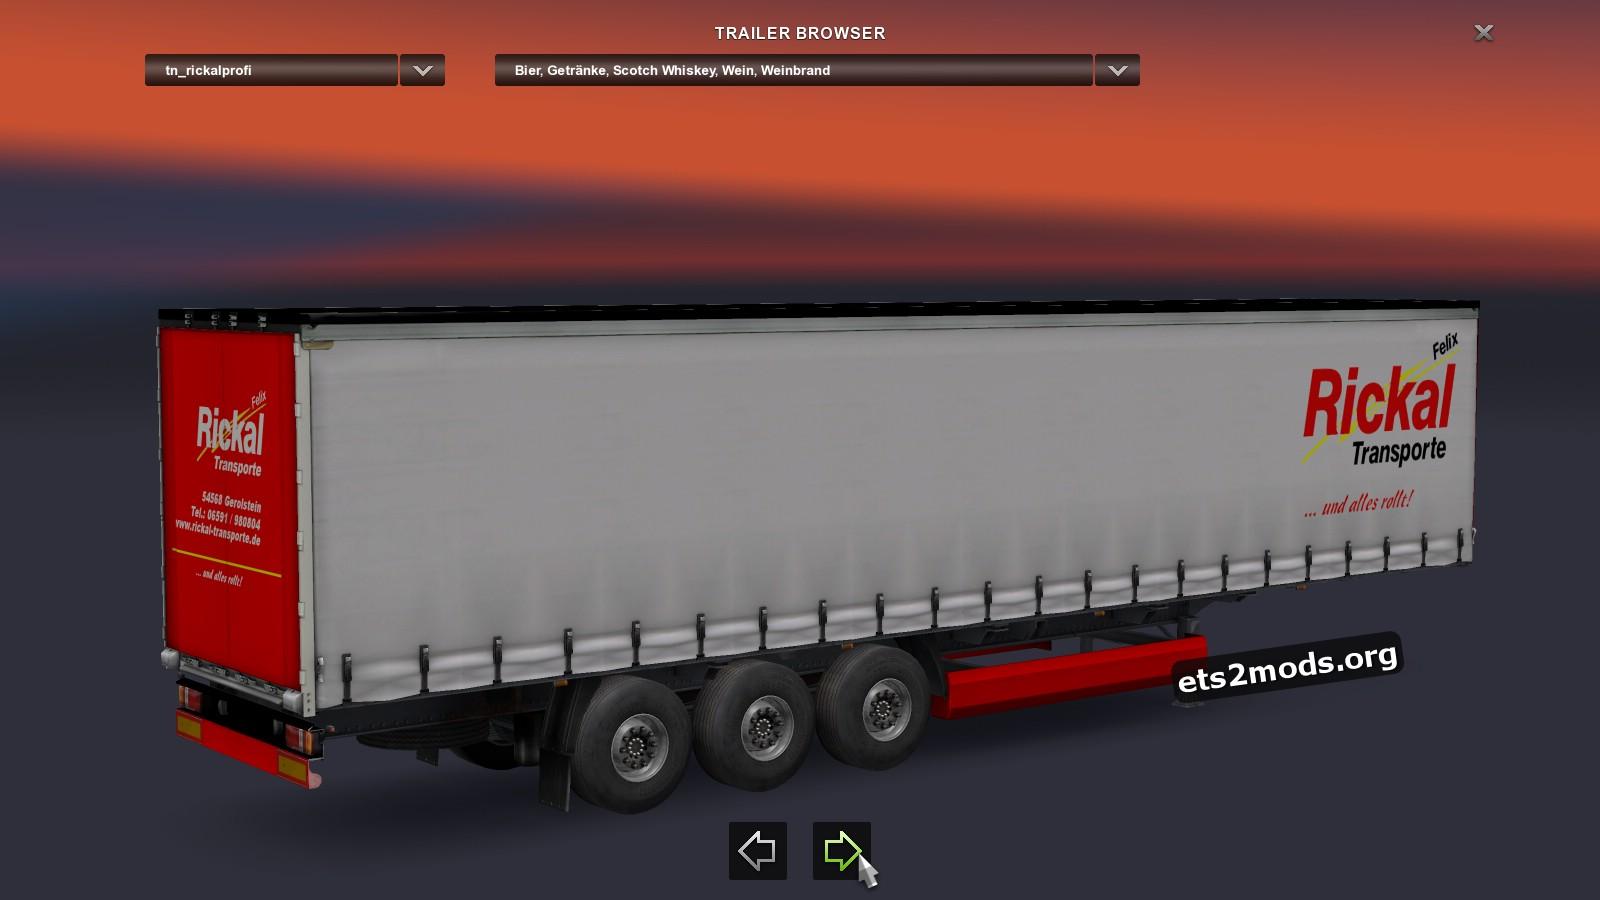 Standalone Rickal Transporte Trailer